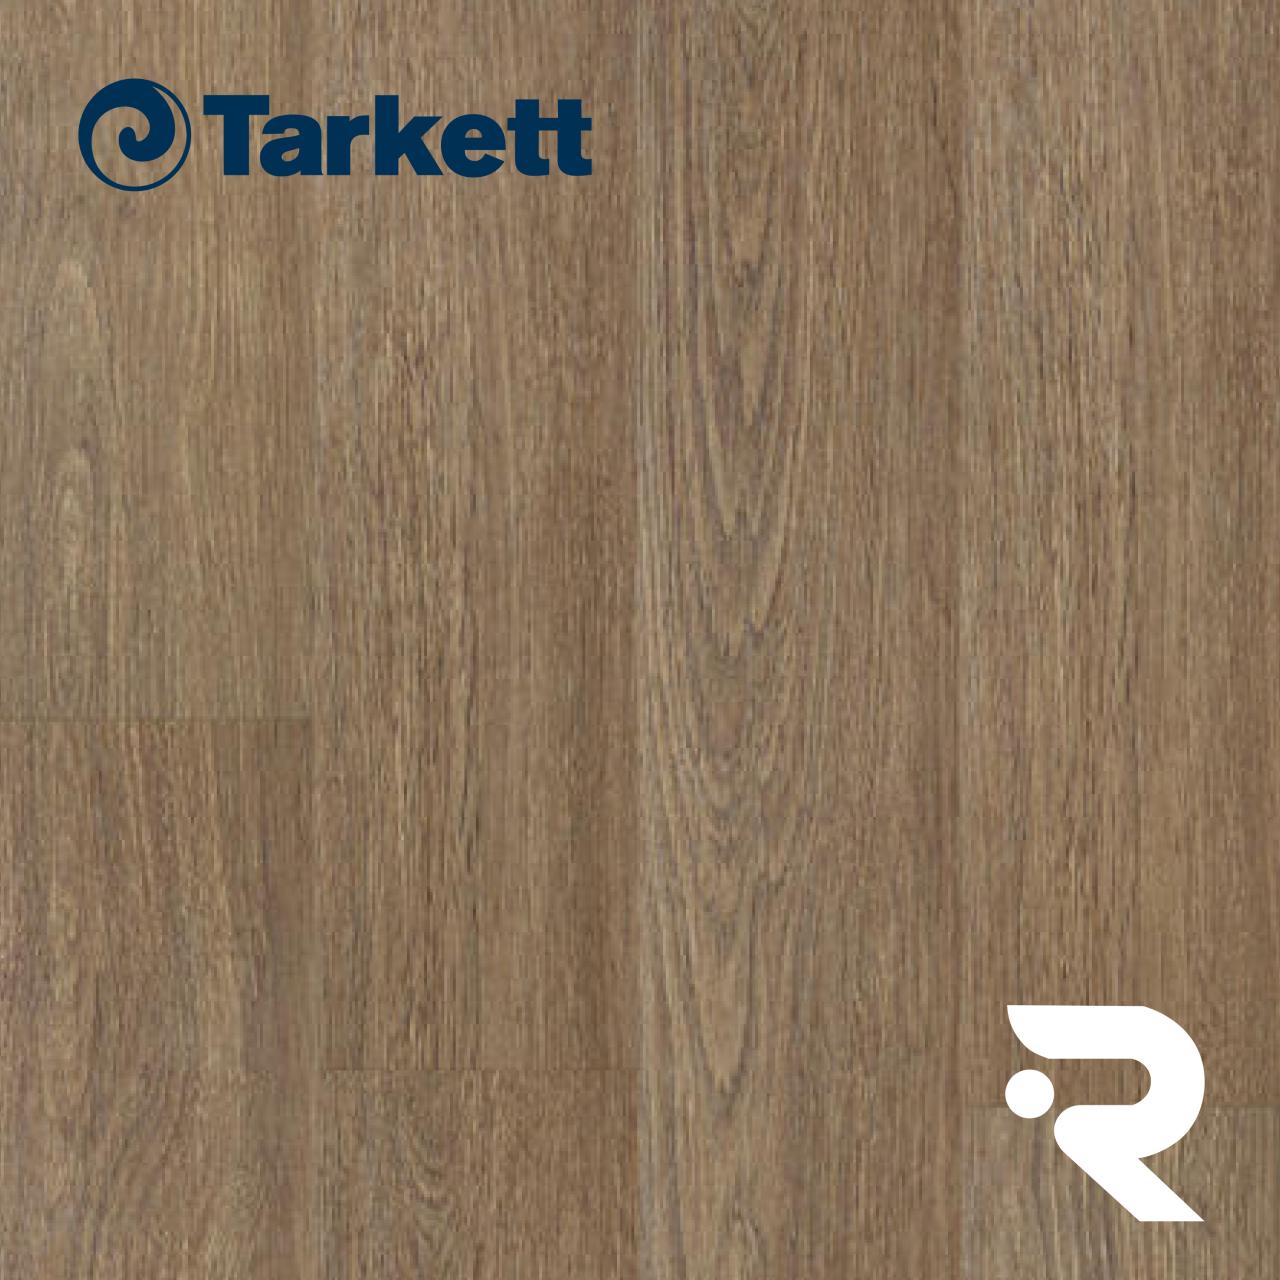 🌳 ПВХ плитка Tarkett | LOUNGE - RAMON | Art Vinyl | 914 x 152 мм